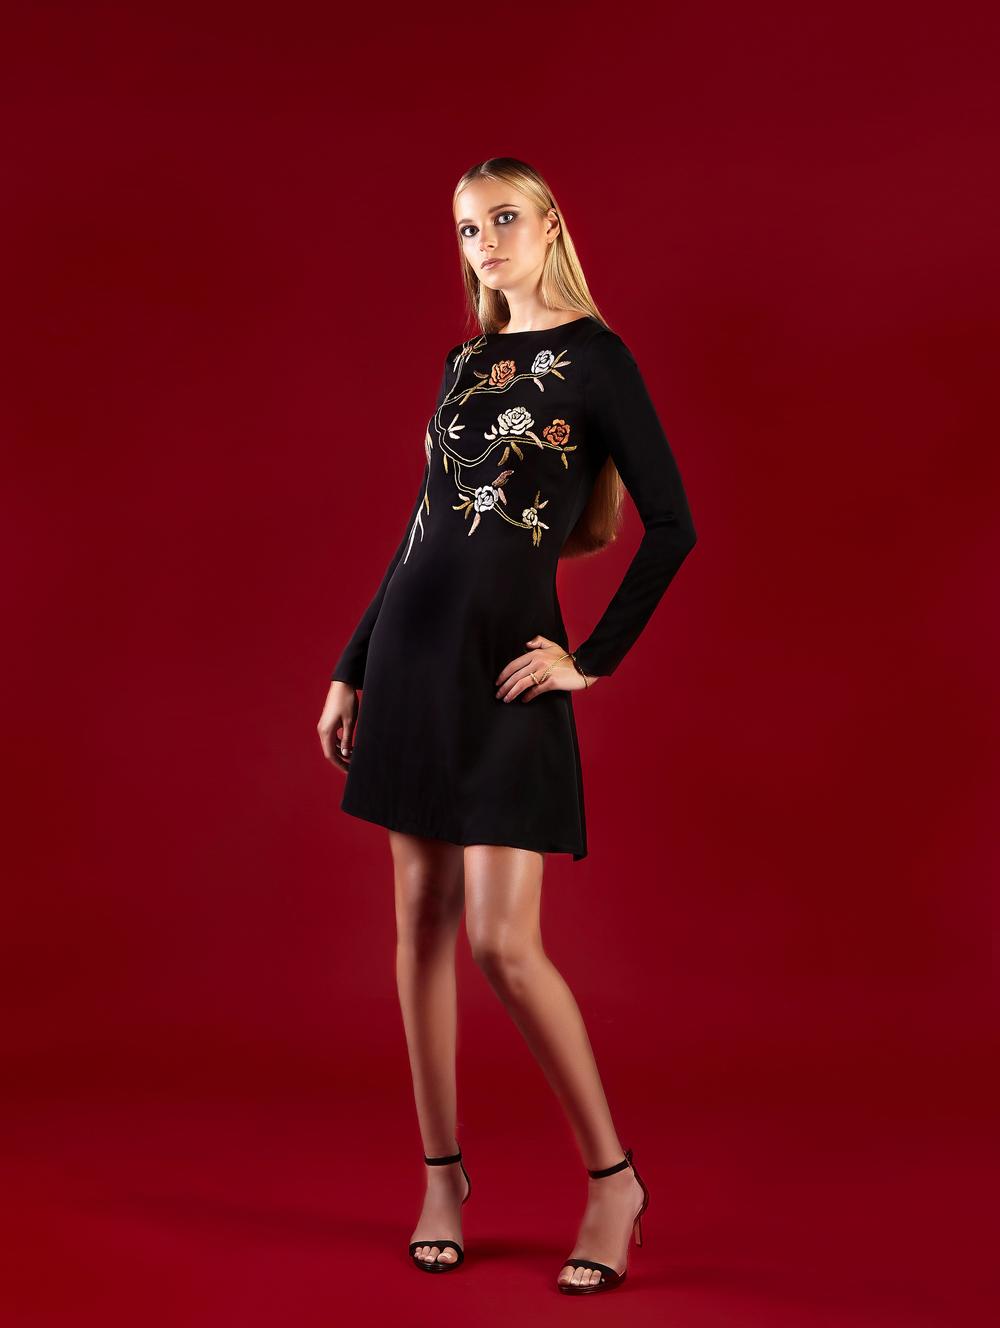 Metallic_Embroidered_Dress3.jpg